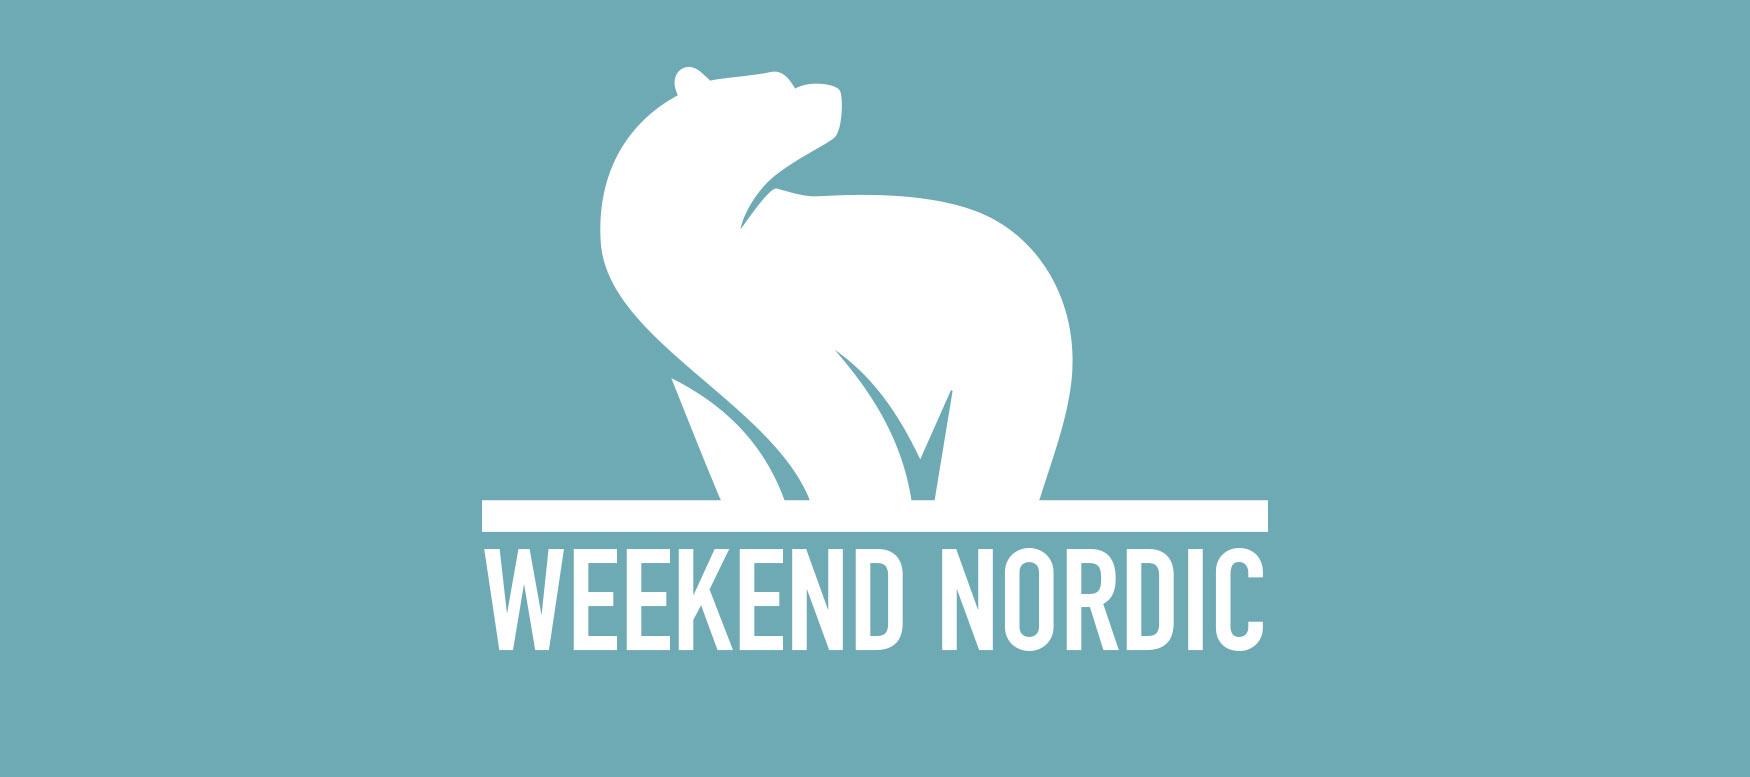 banniere-weekend-nordic-1